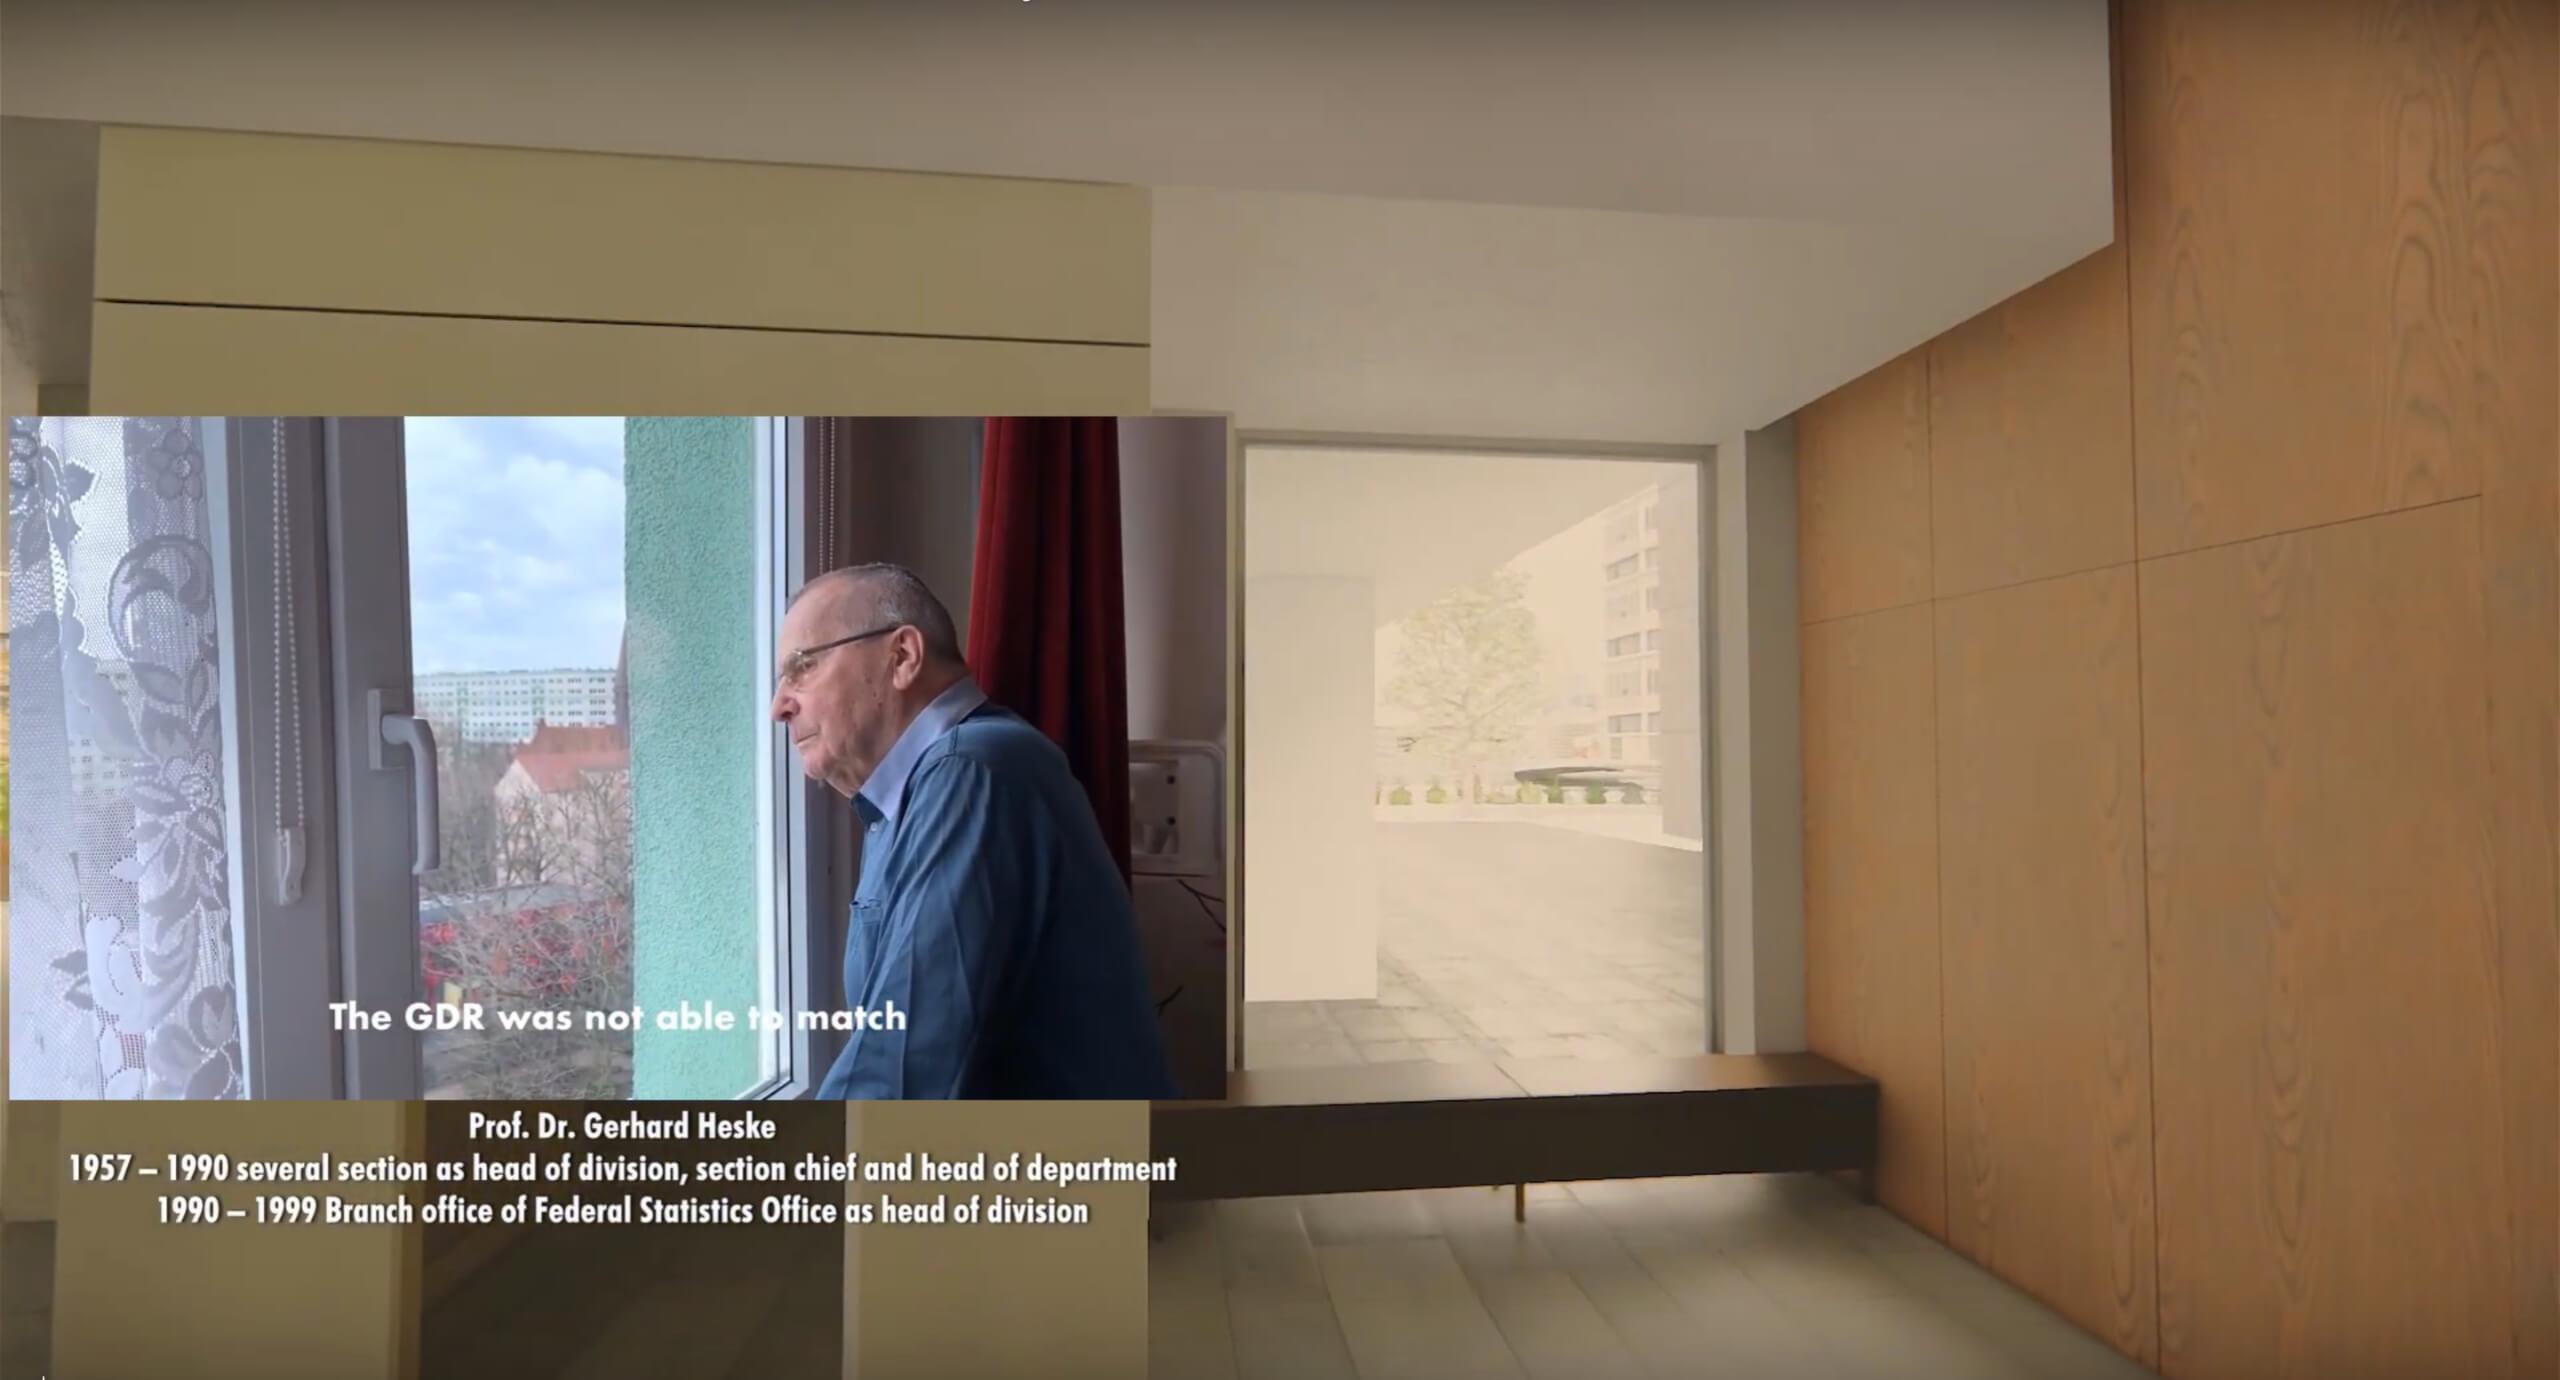 HdS-Ausstellung_Statistiker sind die letzten Romantiker_April 2021_Foyer_Screenshot 1